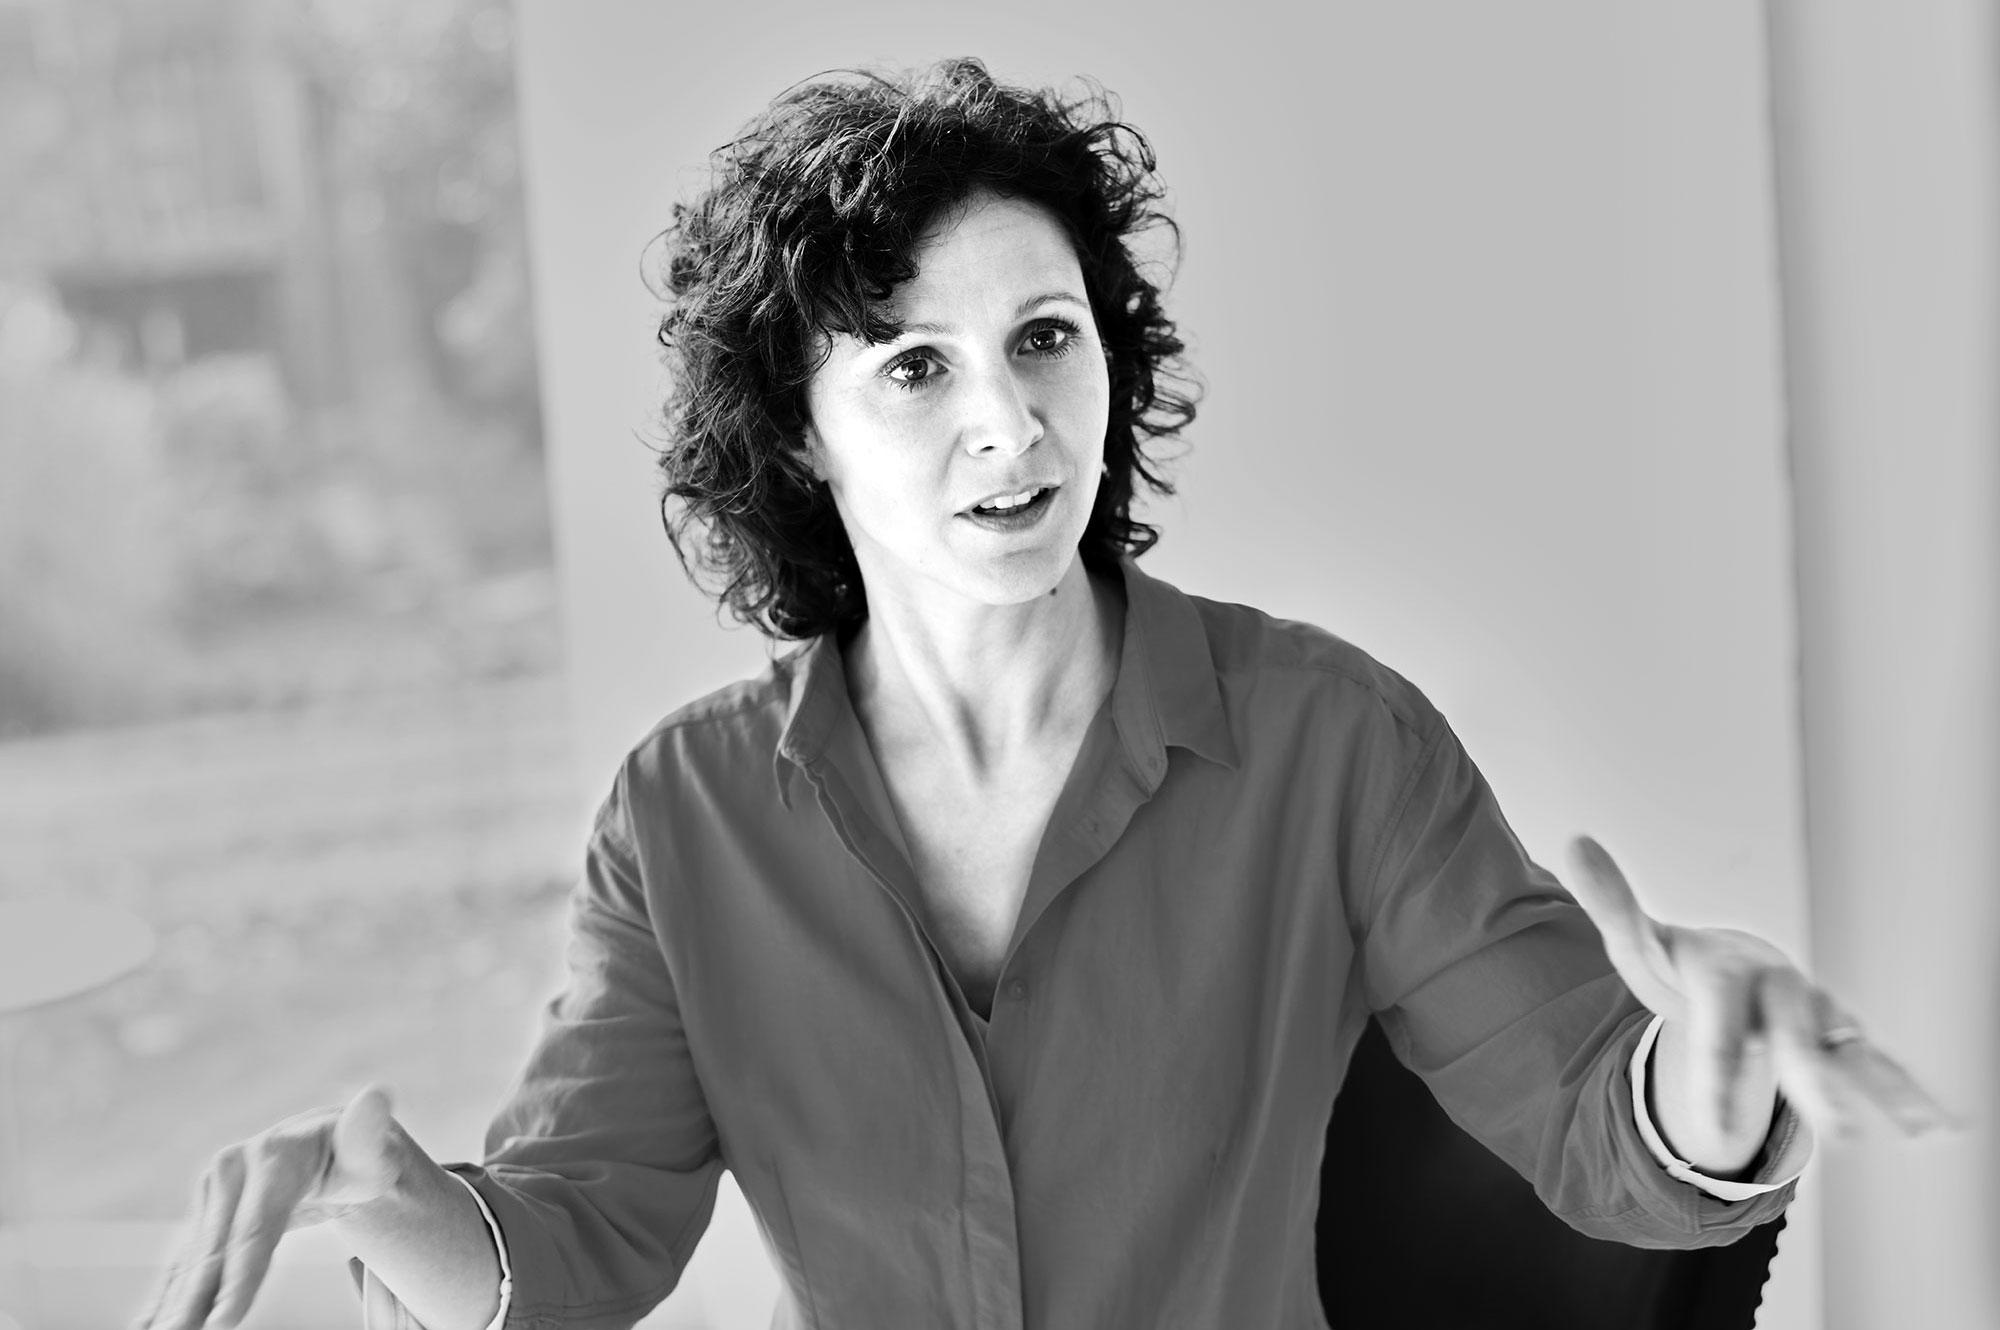 Barbara Behrens